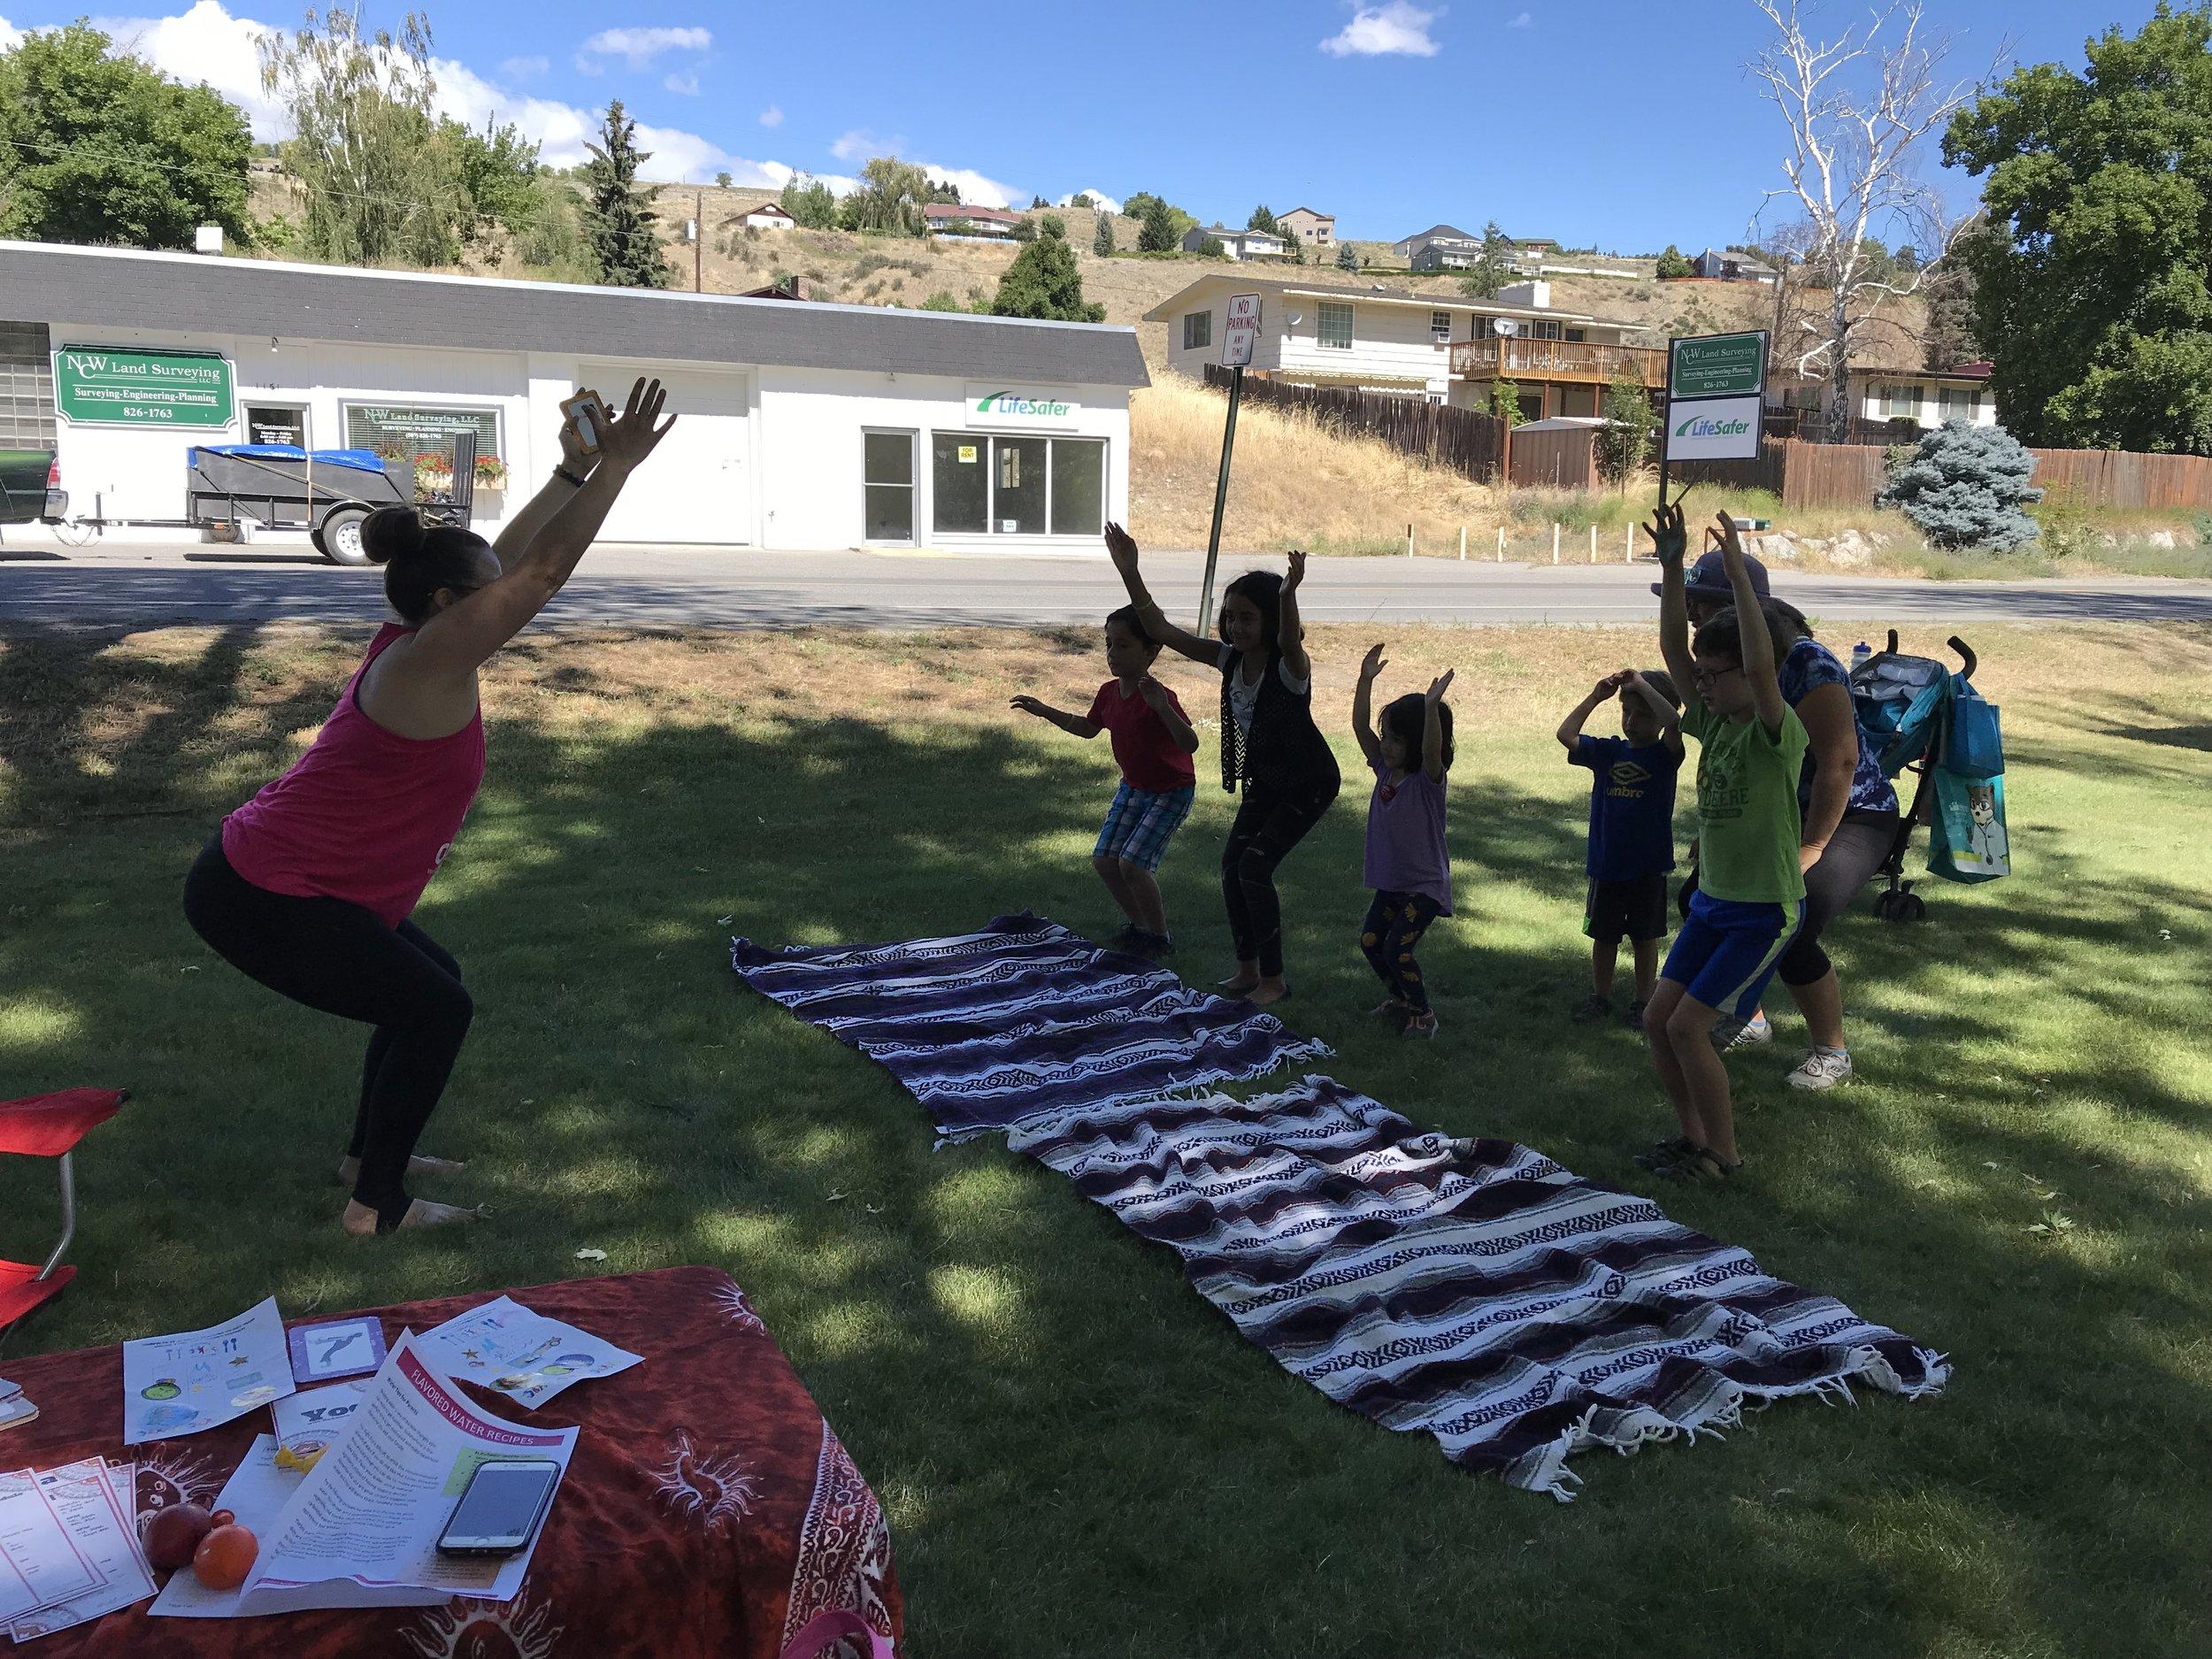 Kids Yoga in the Park at the Healthy Youth Fair, Okanogan, WA